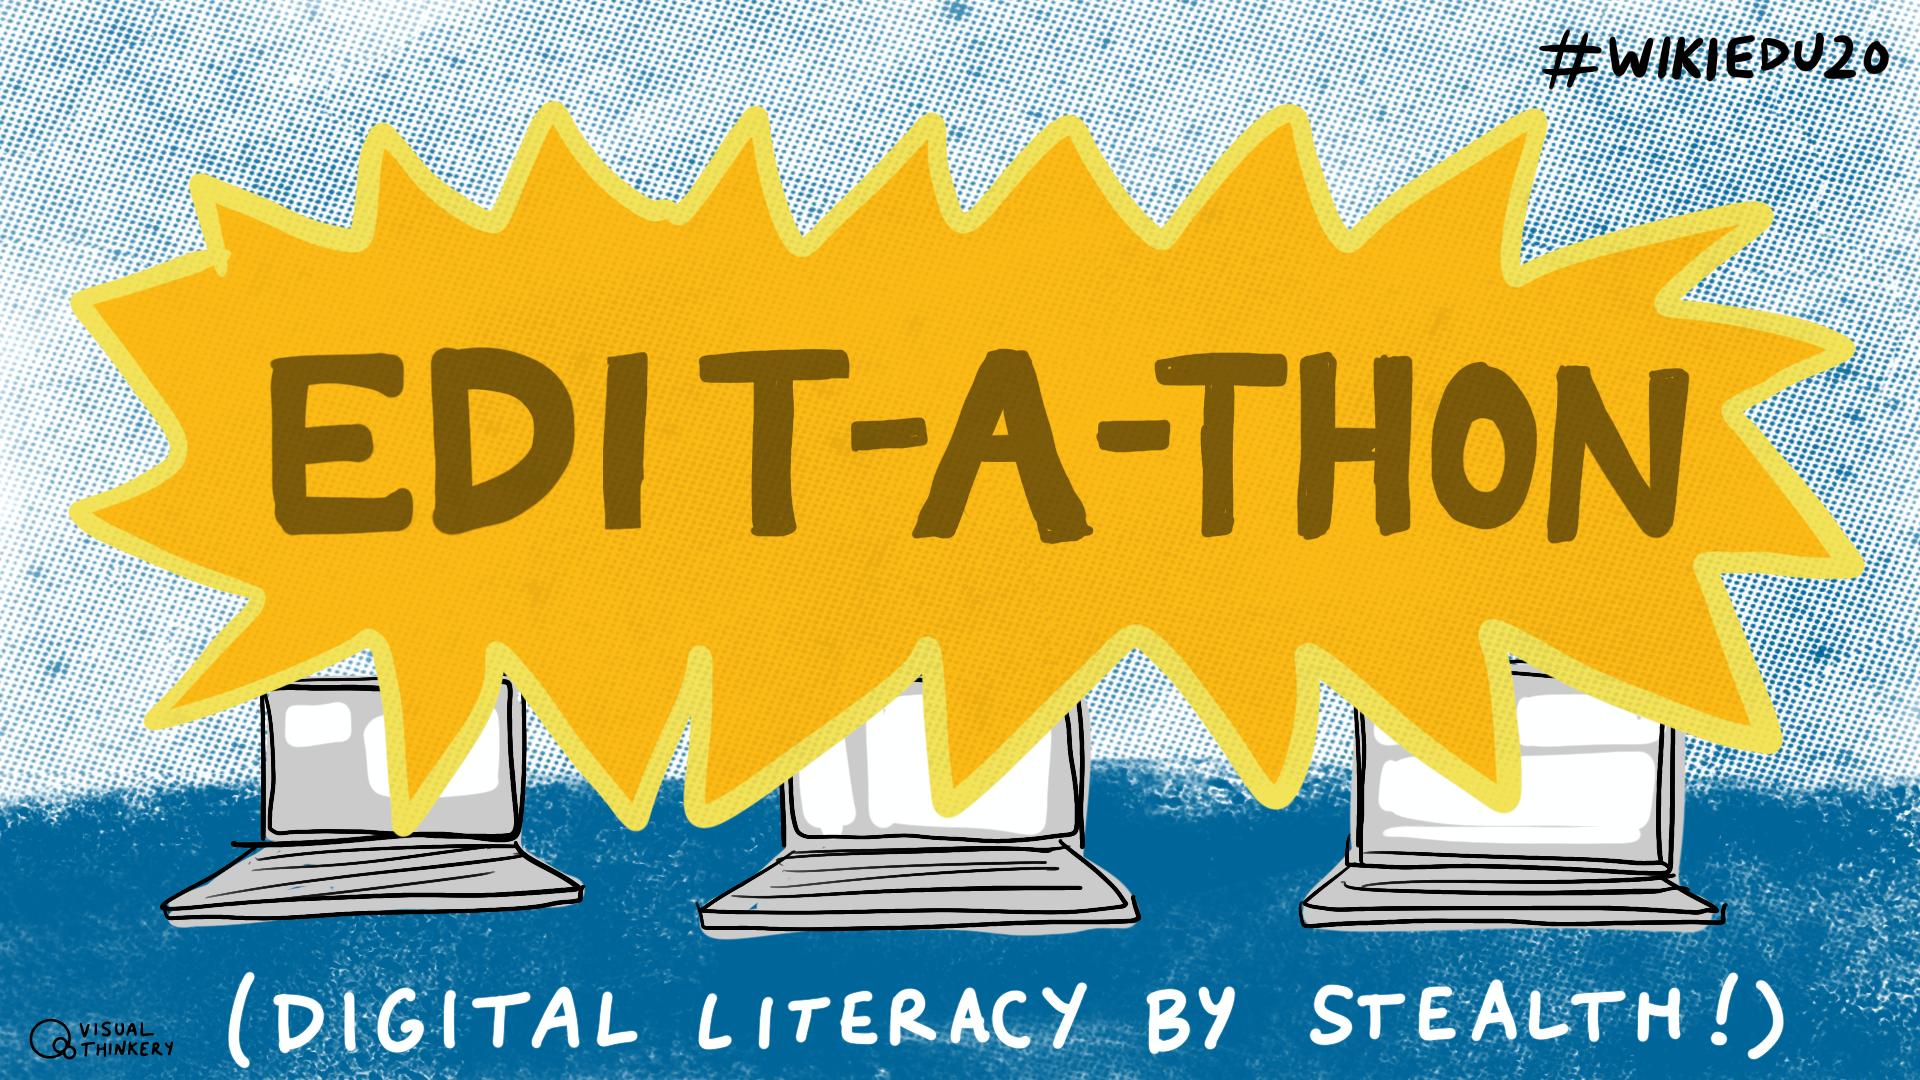 Digital literacy by stealth